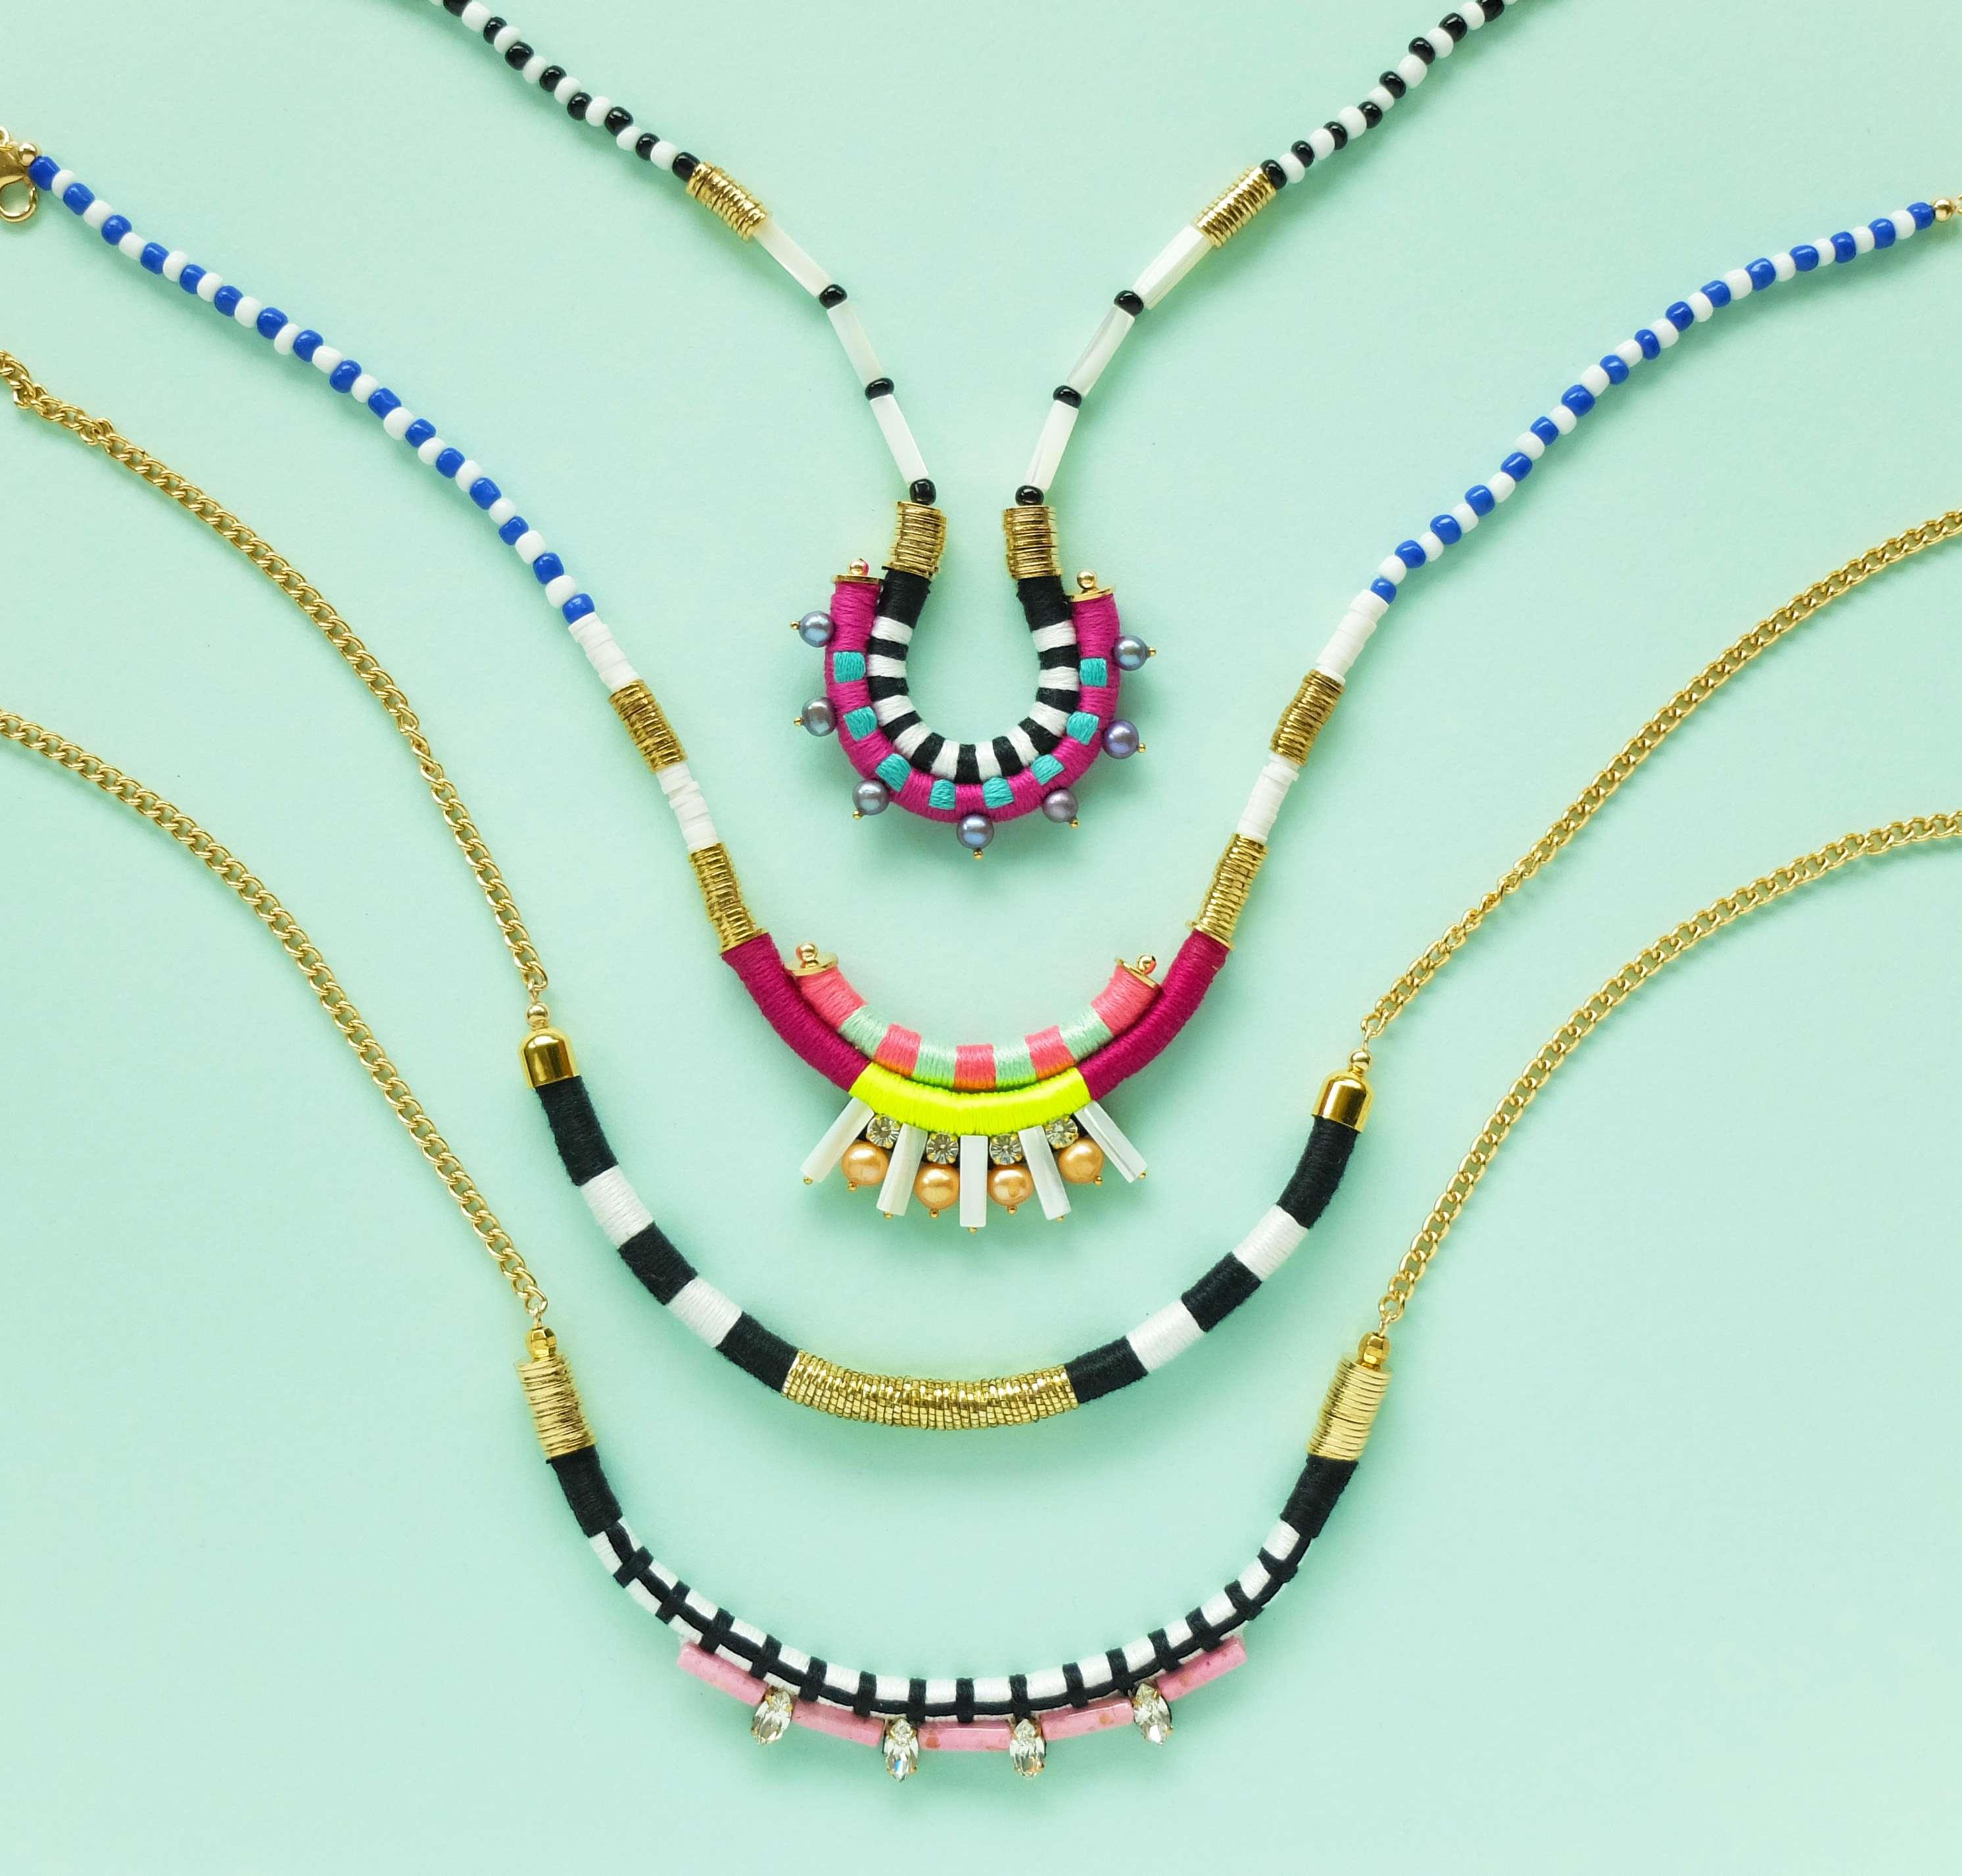 necklacesLAYERSpic-CoralieReiter